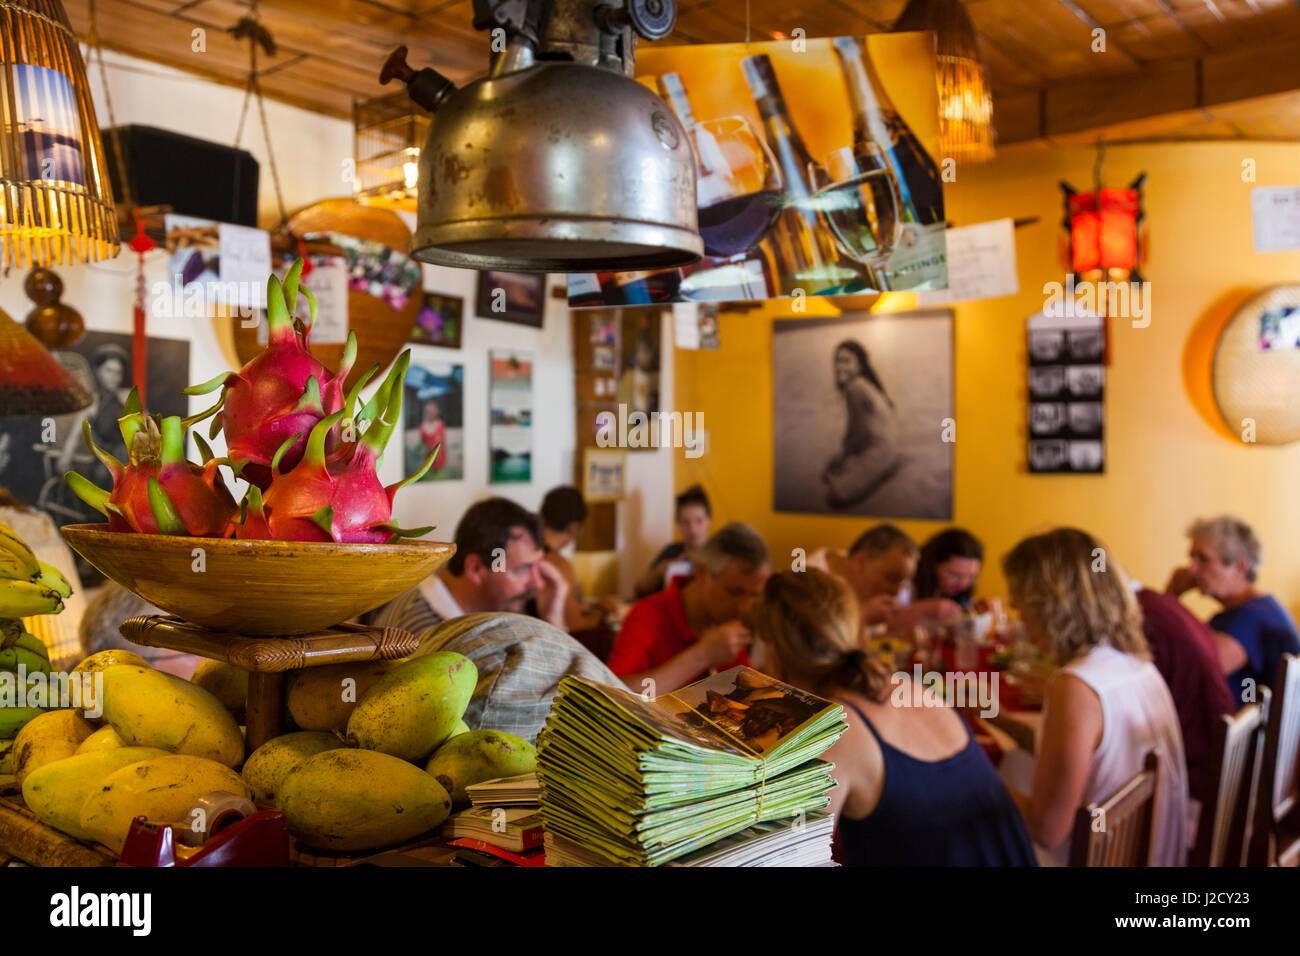 Vietnam, Hue. La Carambole Restaurant, interior of pre-eminent French-Vietnamese eatery - Stock Image